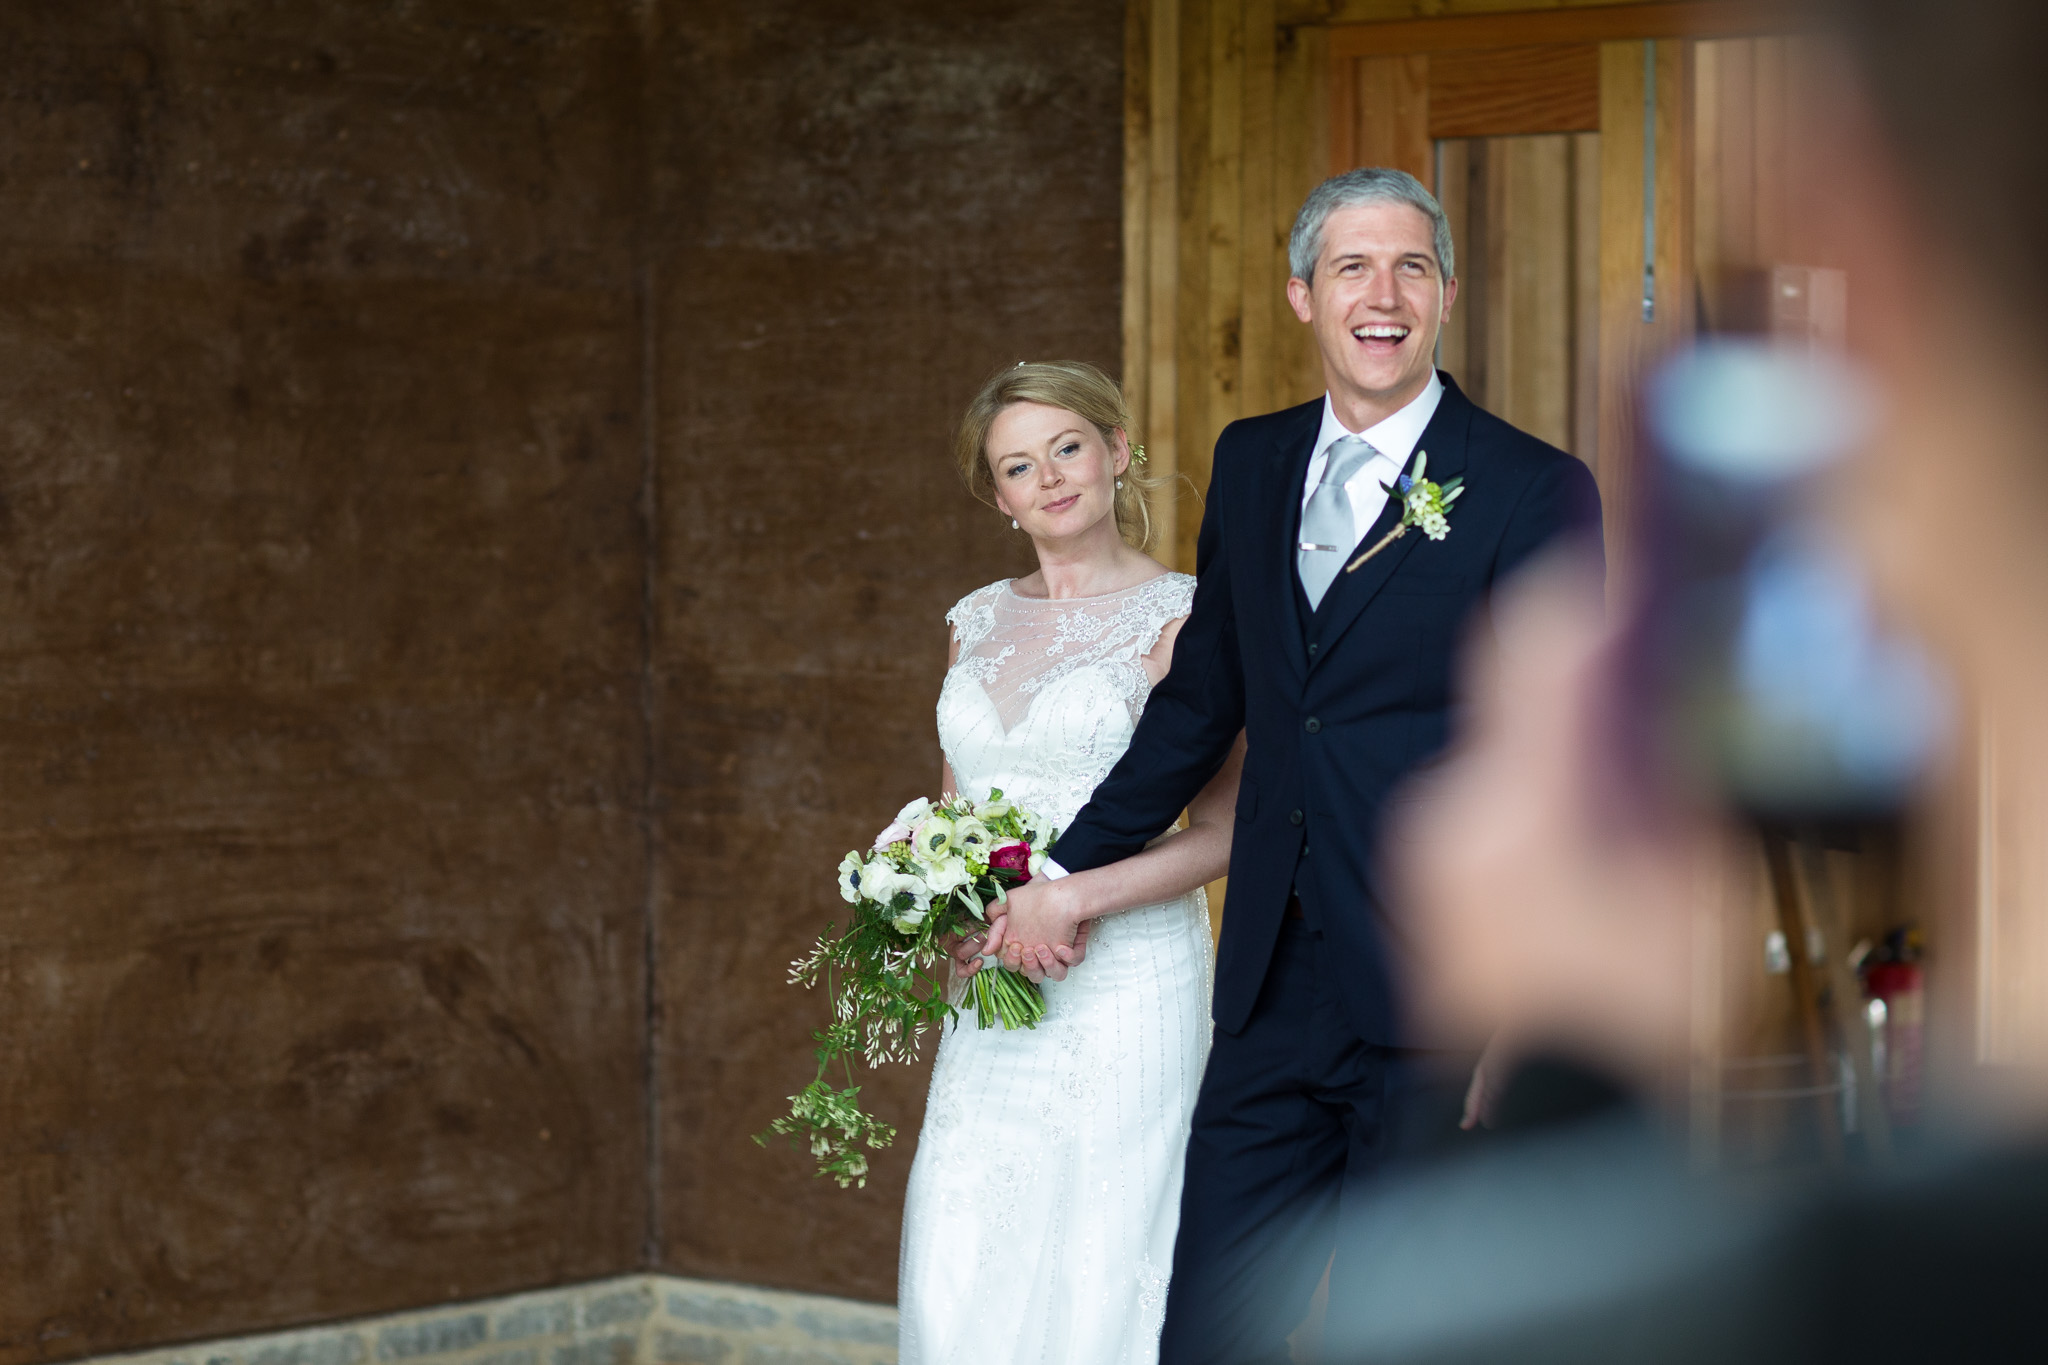 Mark_Barnes_Gloucester_Wedding_Photographer_Elmore_Court_Wedding_Photography_Mike+Kelly-78.jpg